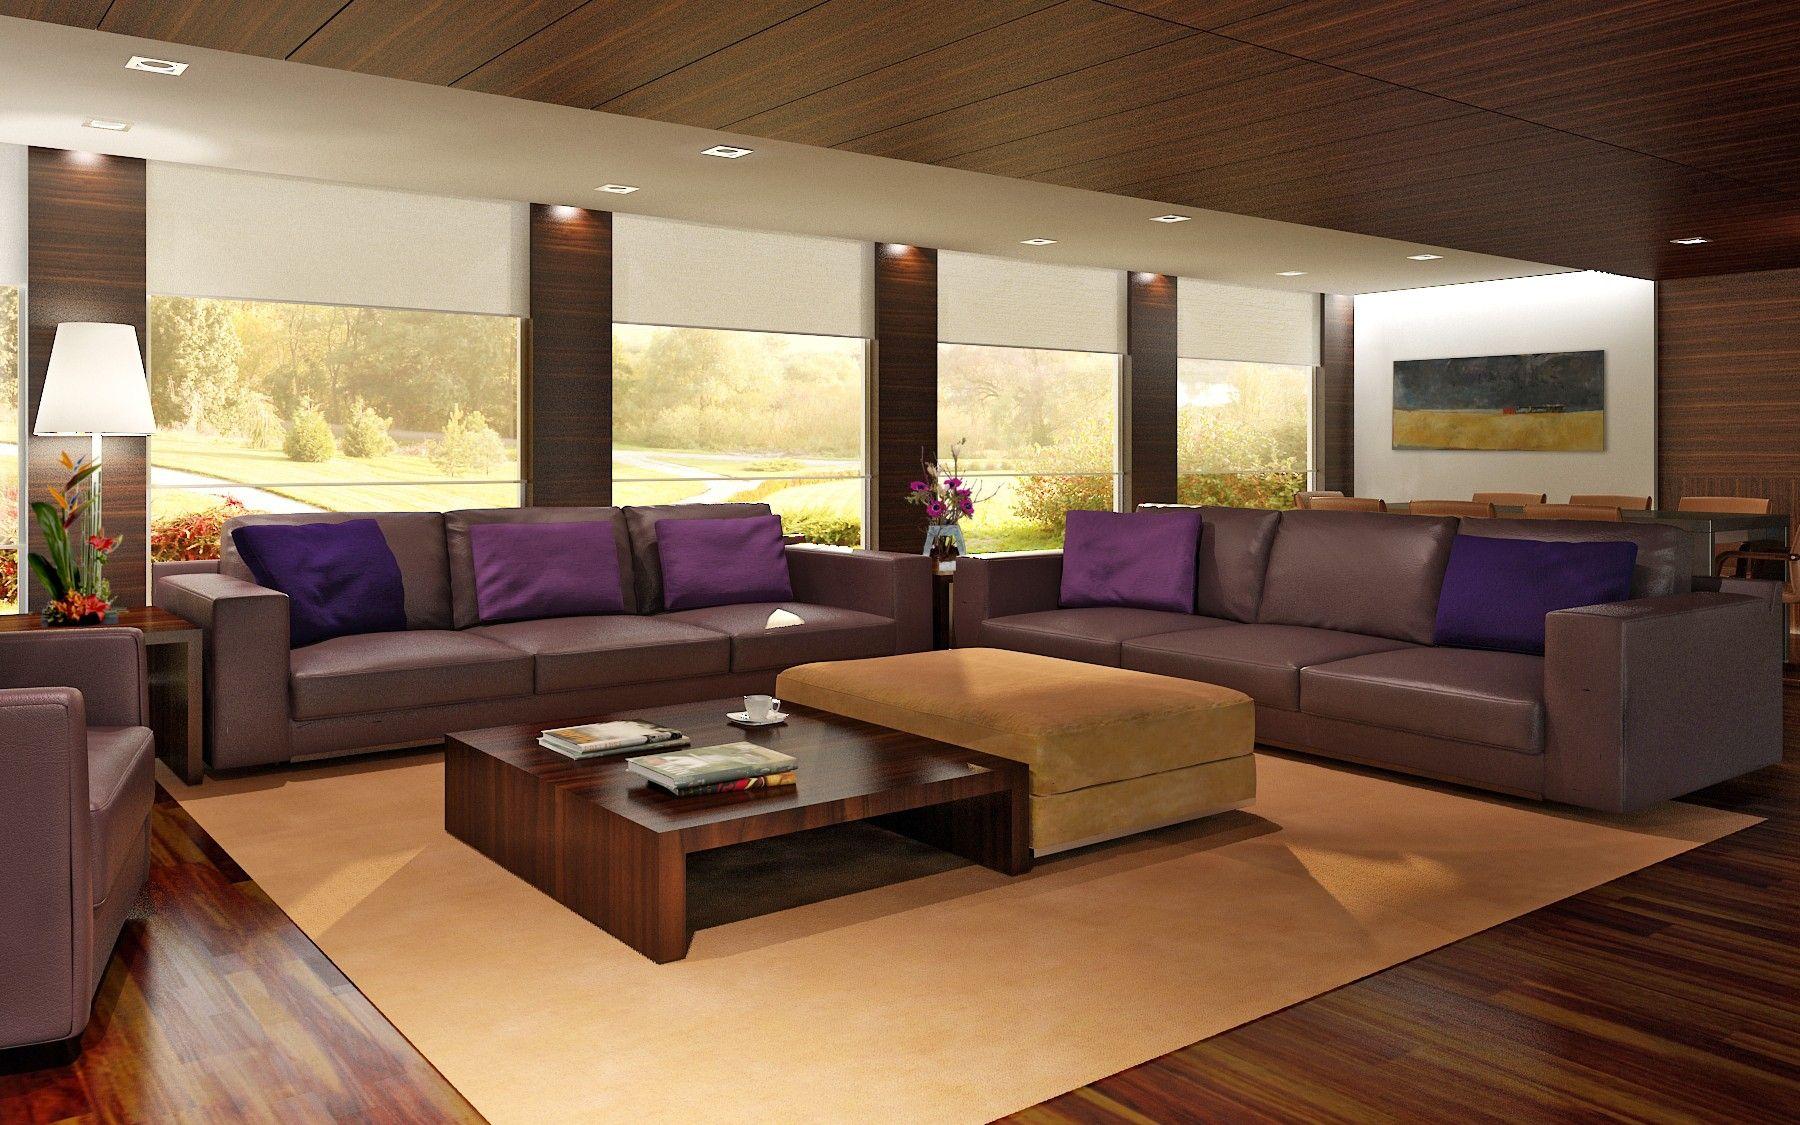 Latest Living Room Furniture Latest Ceiling Design For Living Room Living Room False Ceiling